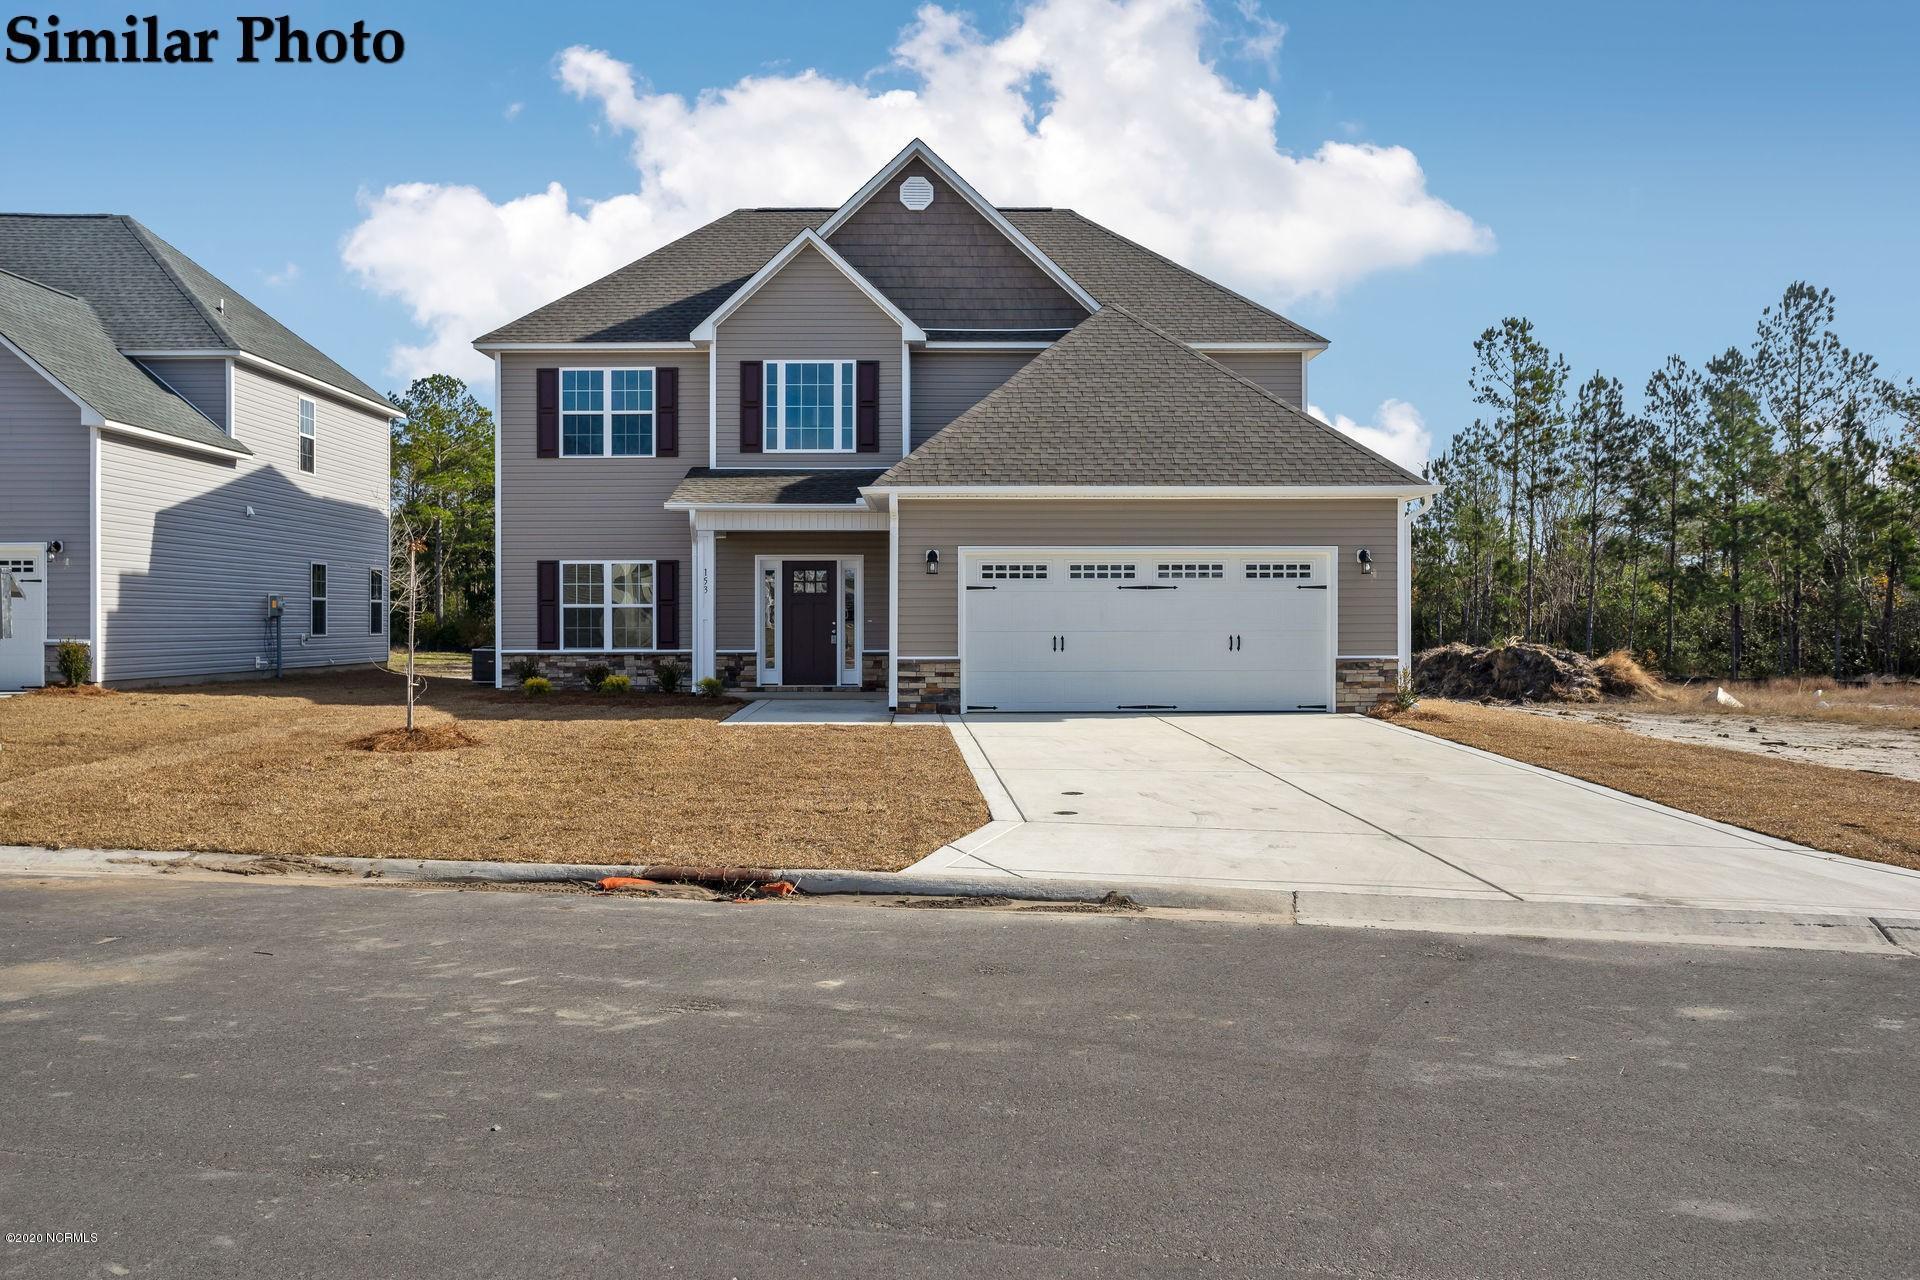 799 Habersham Avenue, Rocky Point, North Carolina 28457, 4 Bedrooms Bedrooms, ,3 BathroomsBathrooms,Single Family,For Sale,799 Habersham Avenue,2,100247583